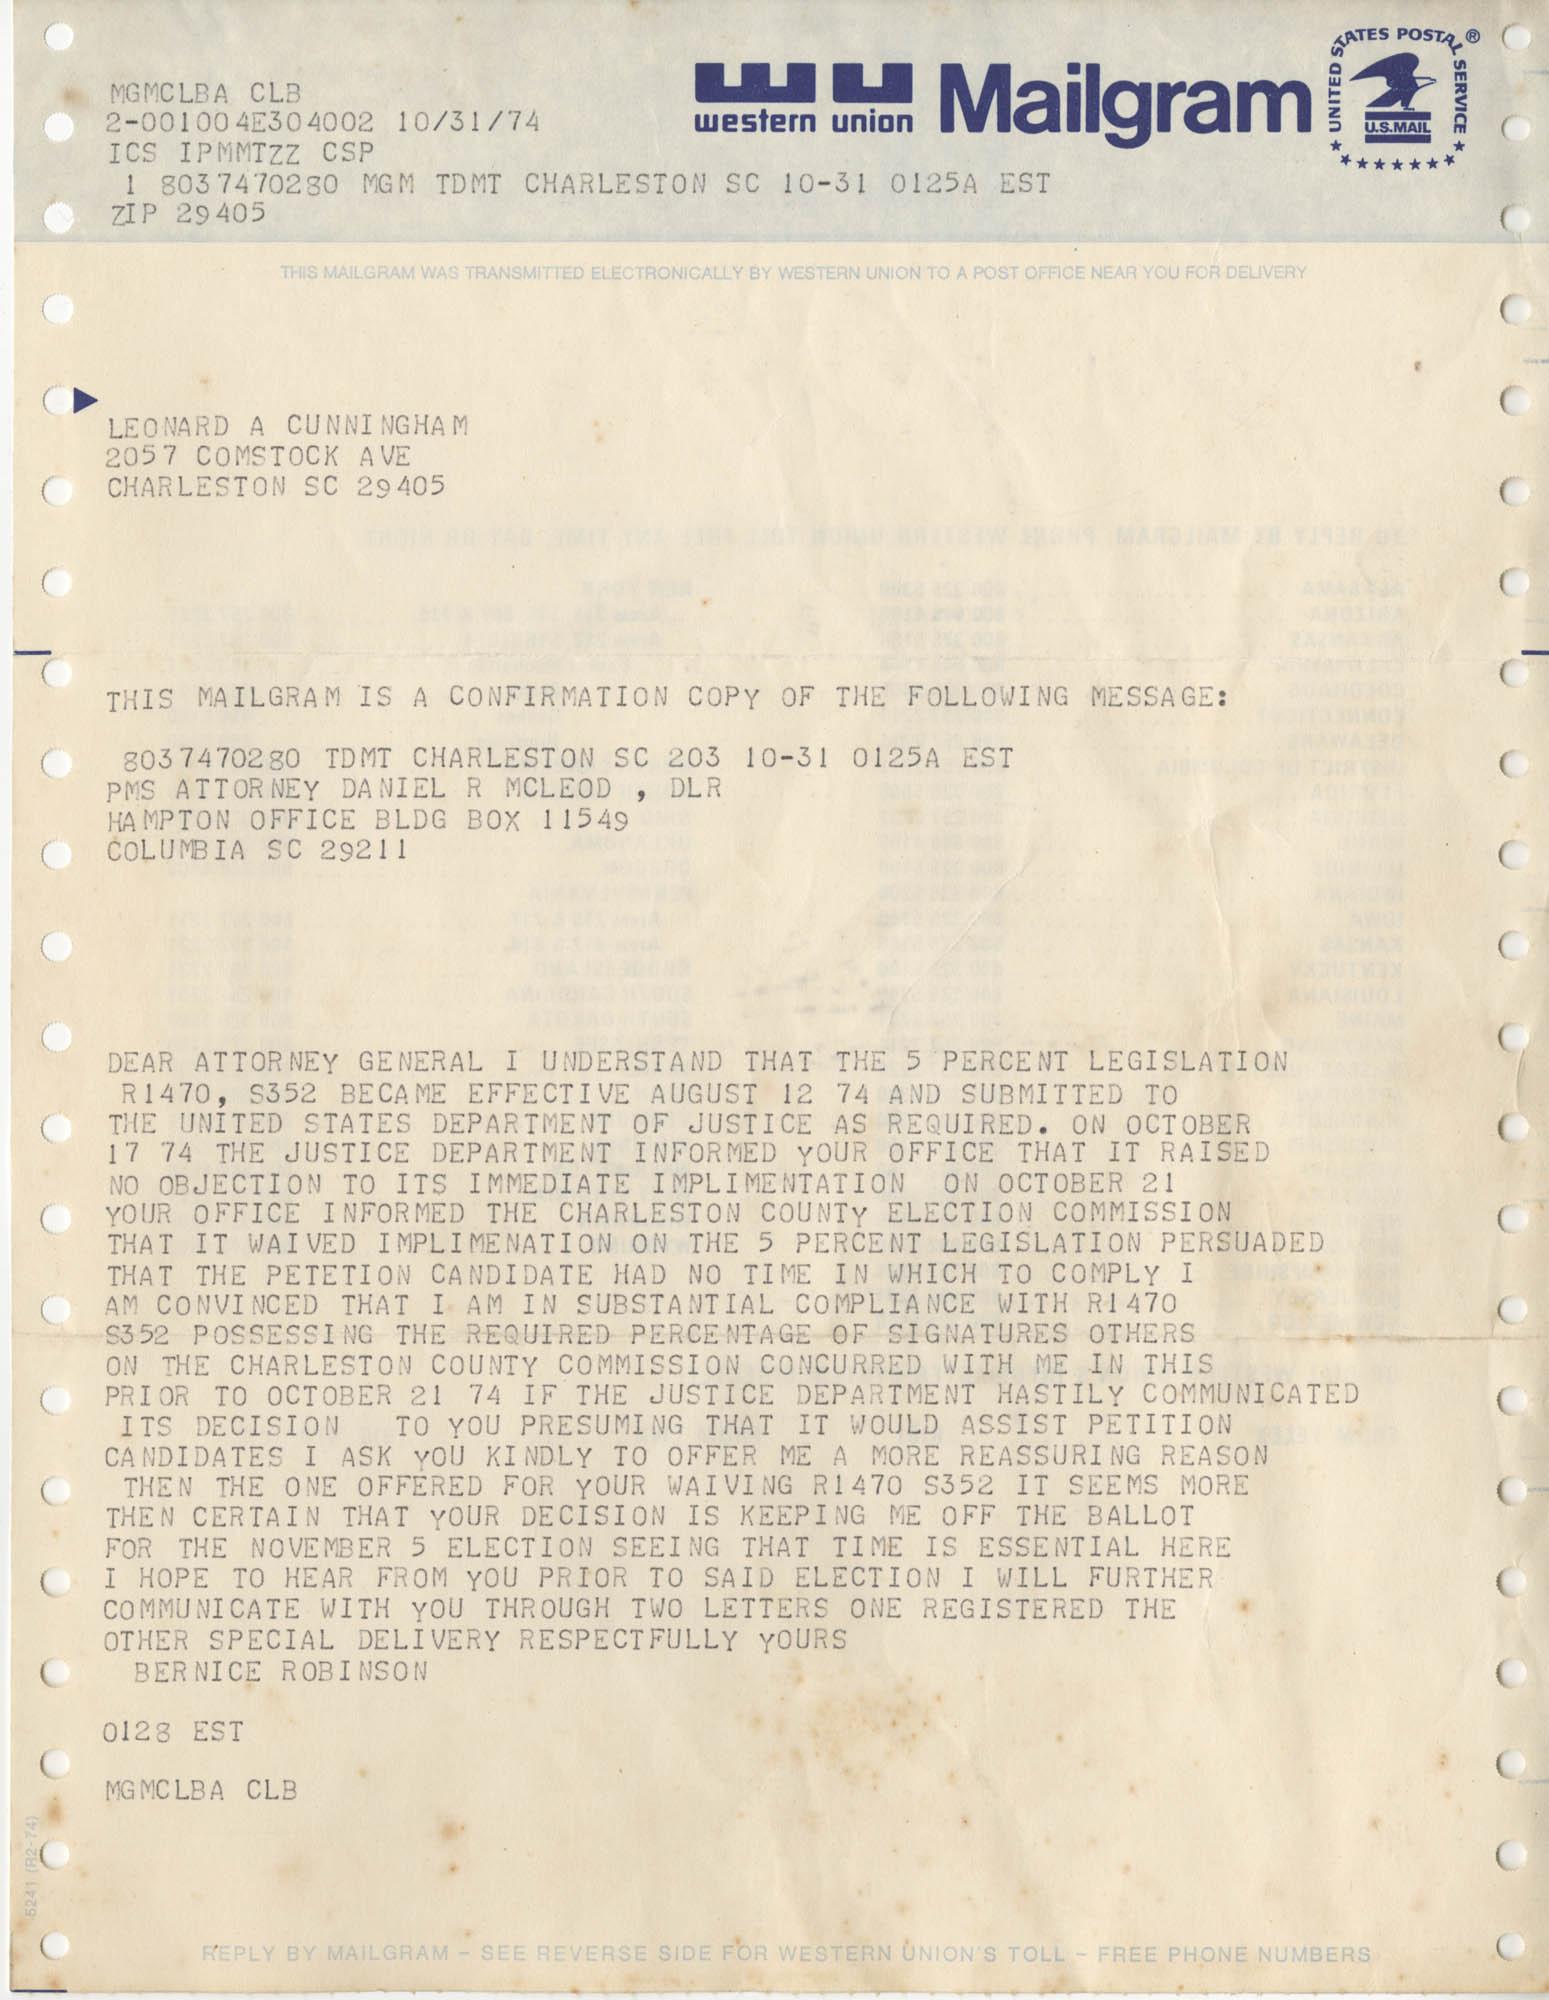 Mailgram from Bernice Robinson to Leonard Cunningham, October 31, 1974